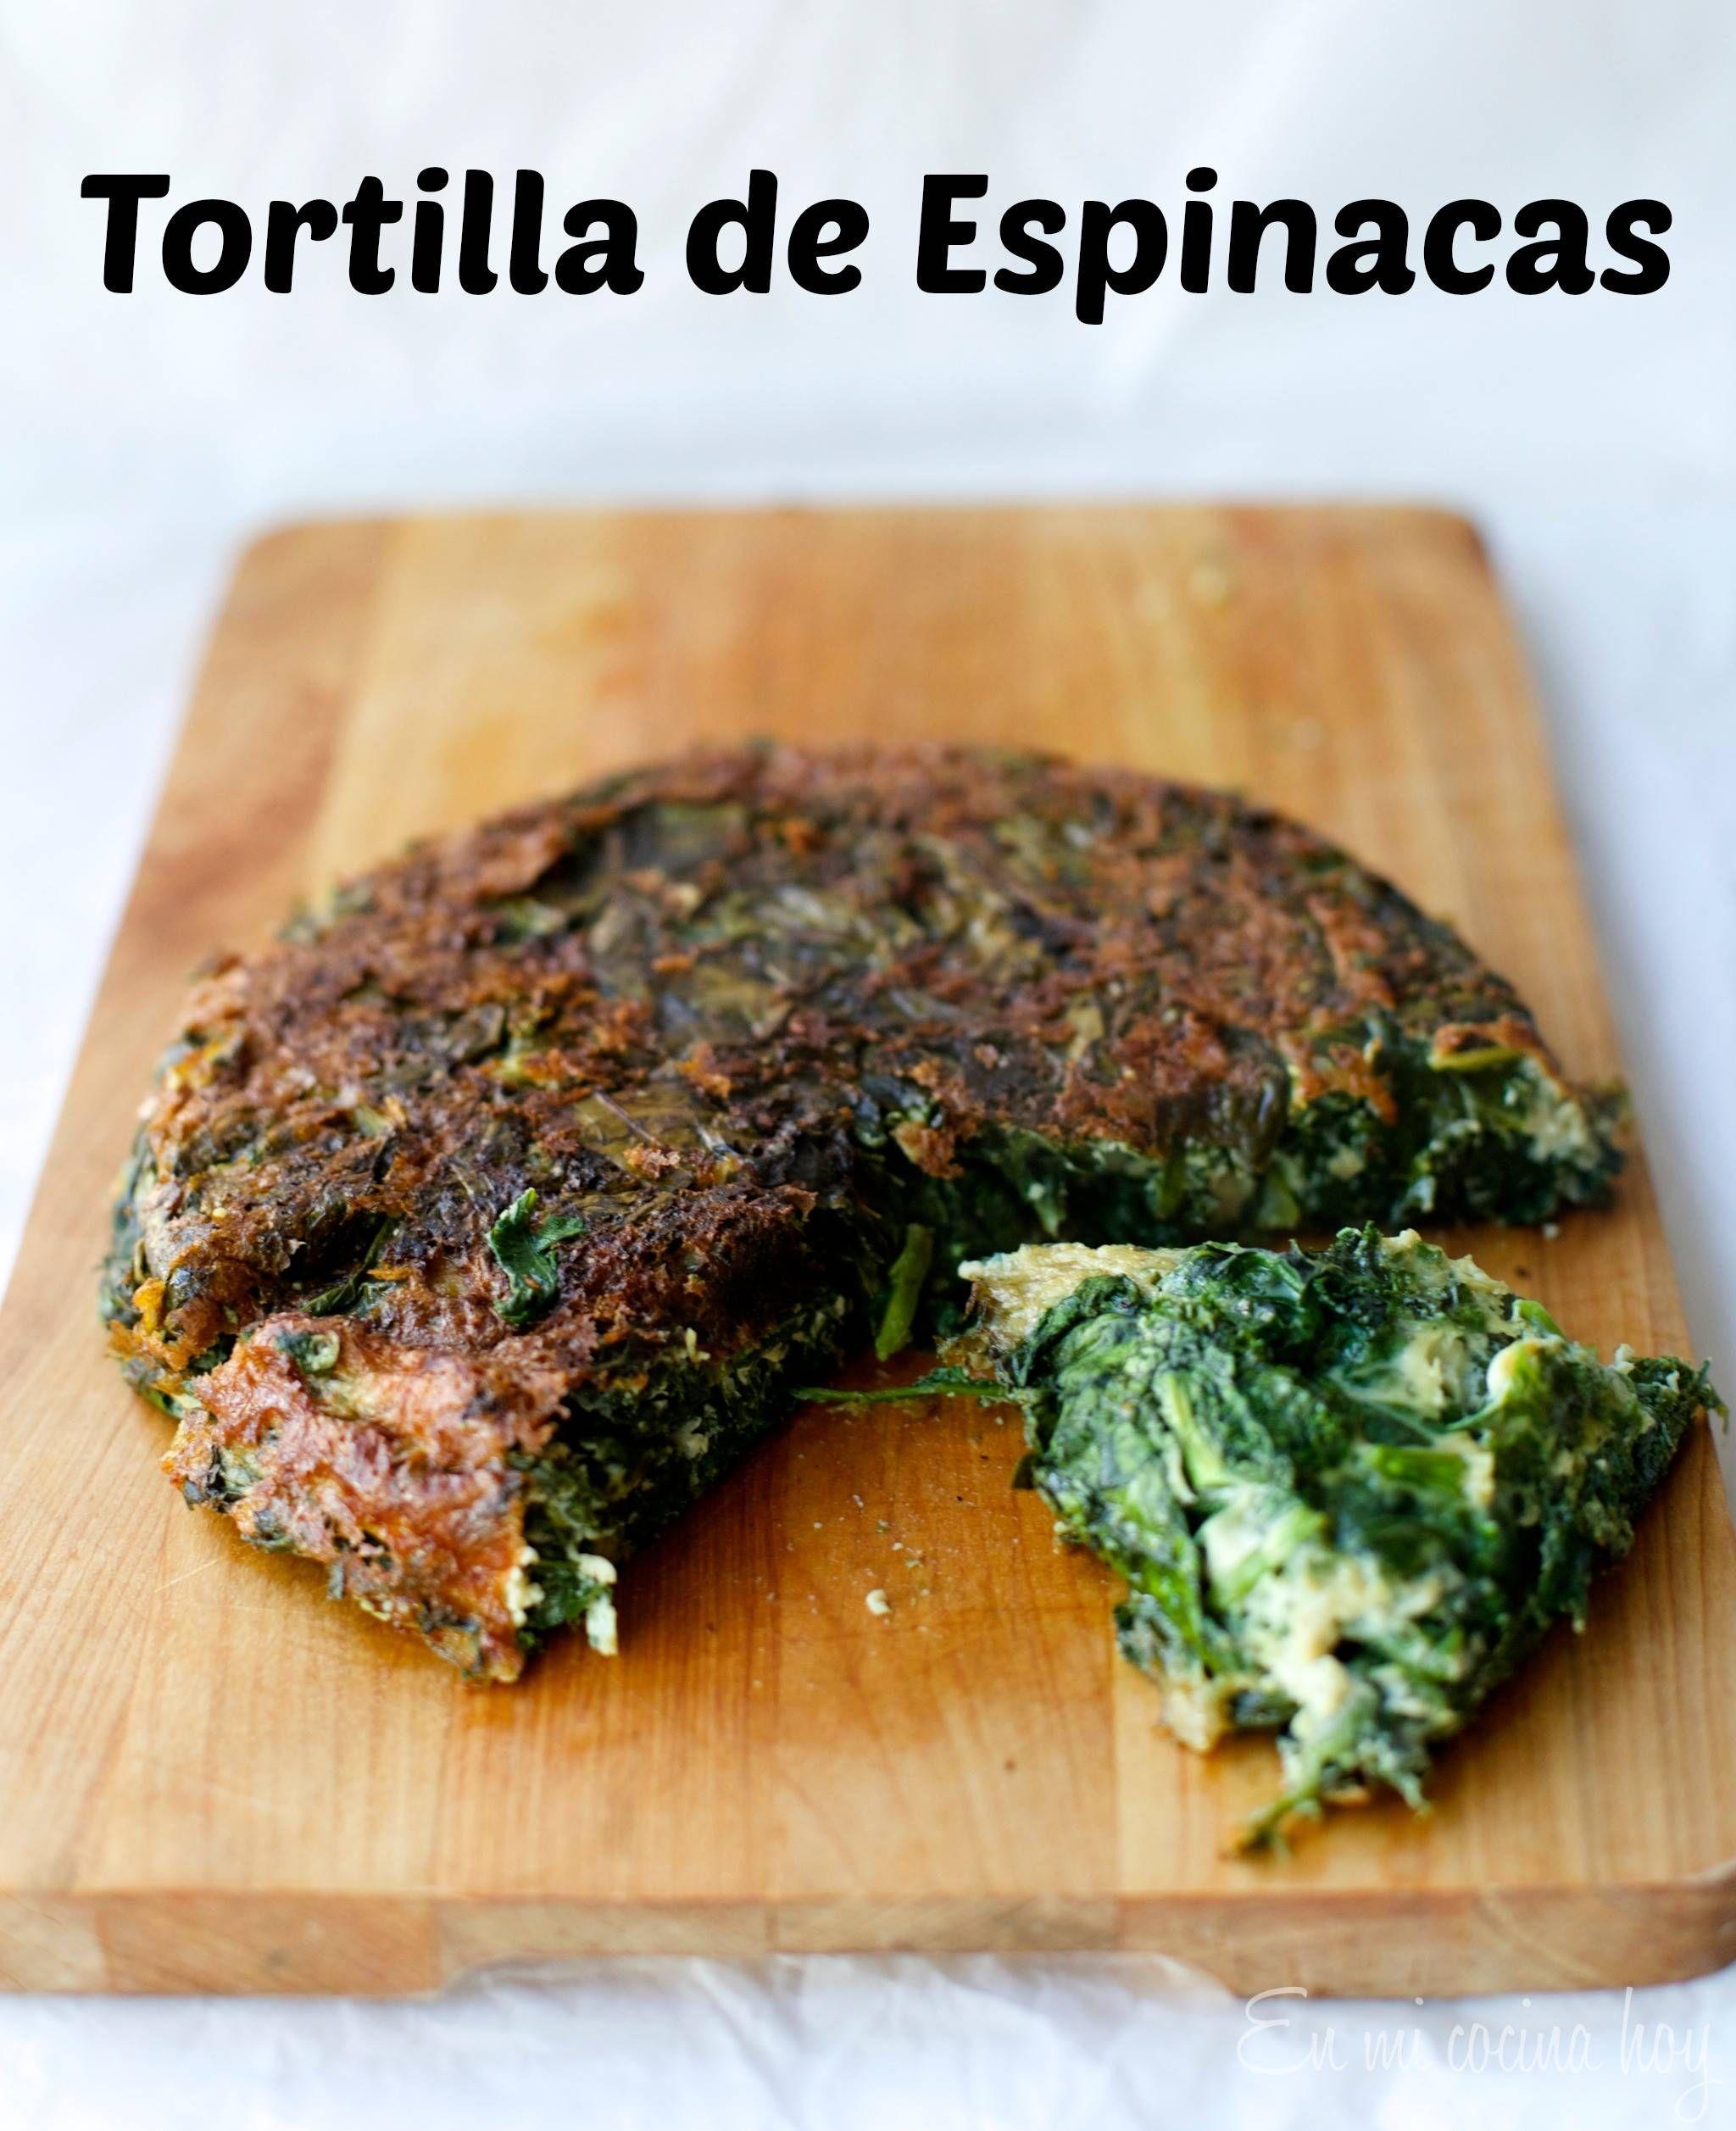 Tortilla de espinacas chilean recipes spanish recipes and foods tortilla de espinacas en mi cocina hoy chilean recipeschilean foodamerican forumfinder Image collections